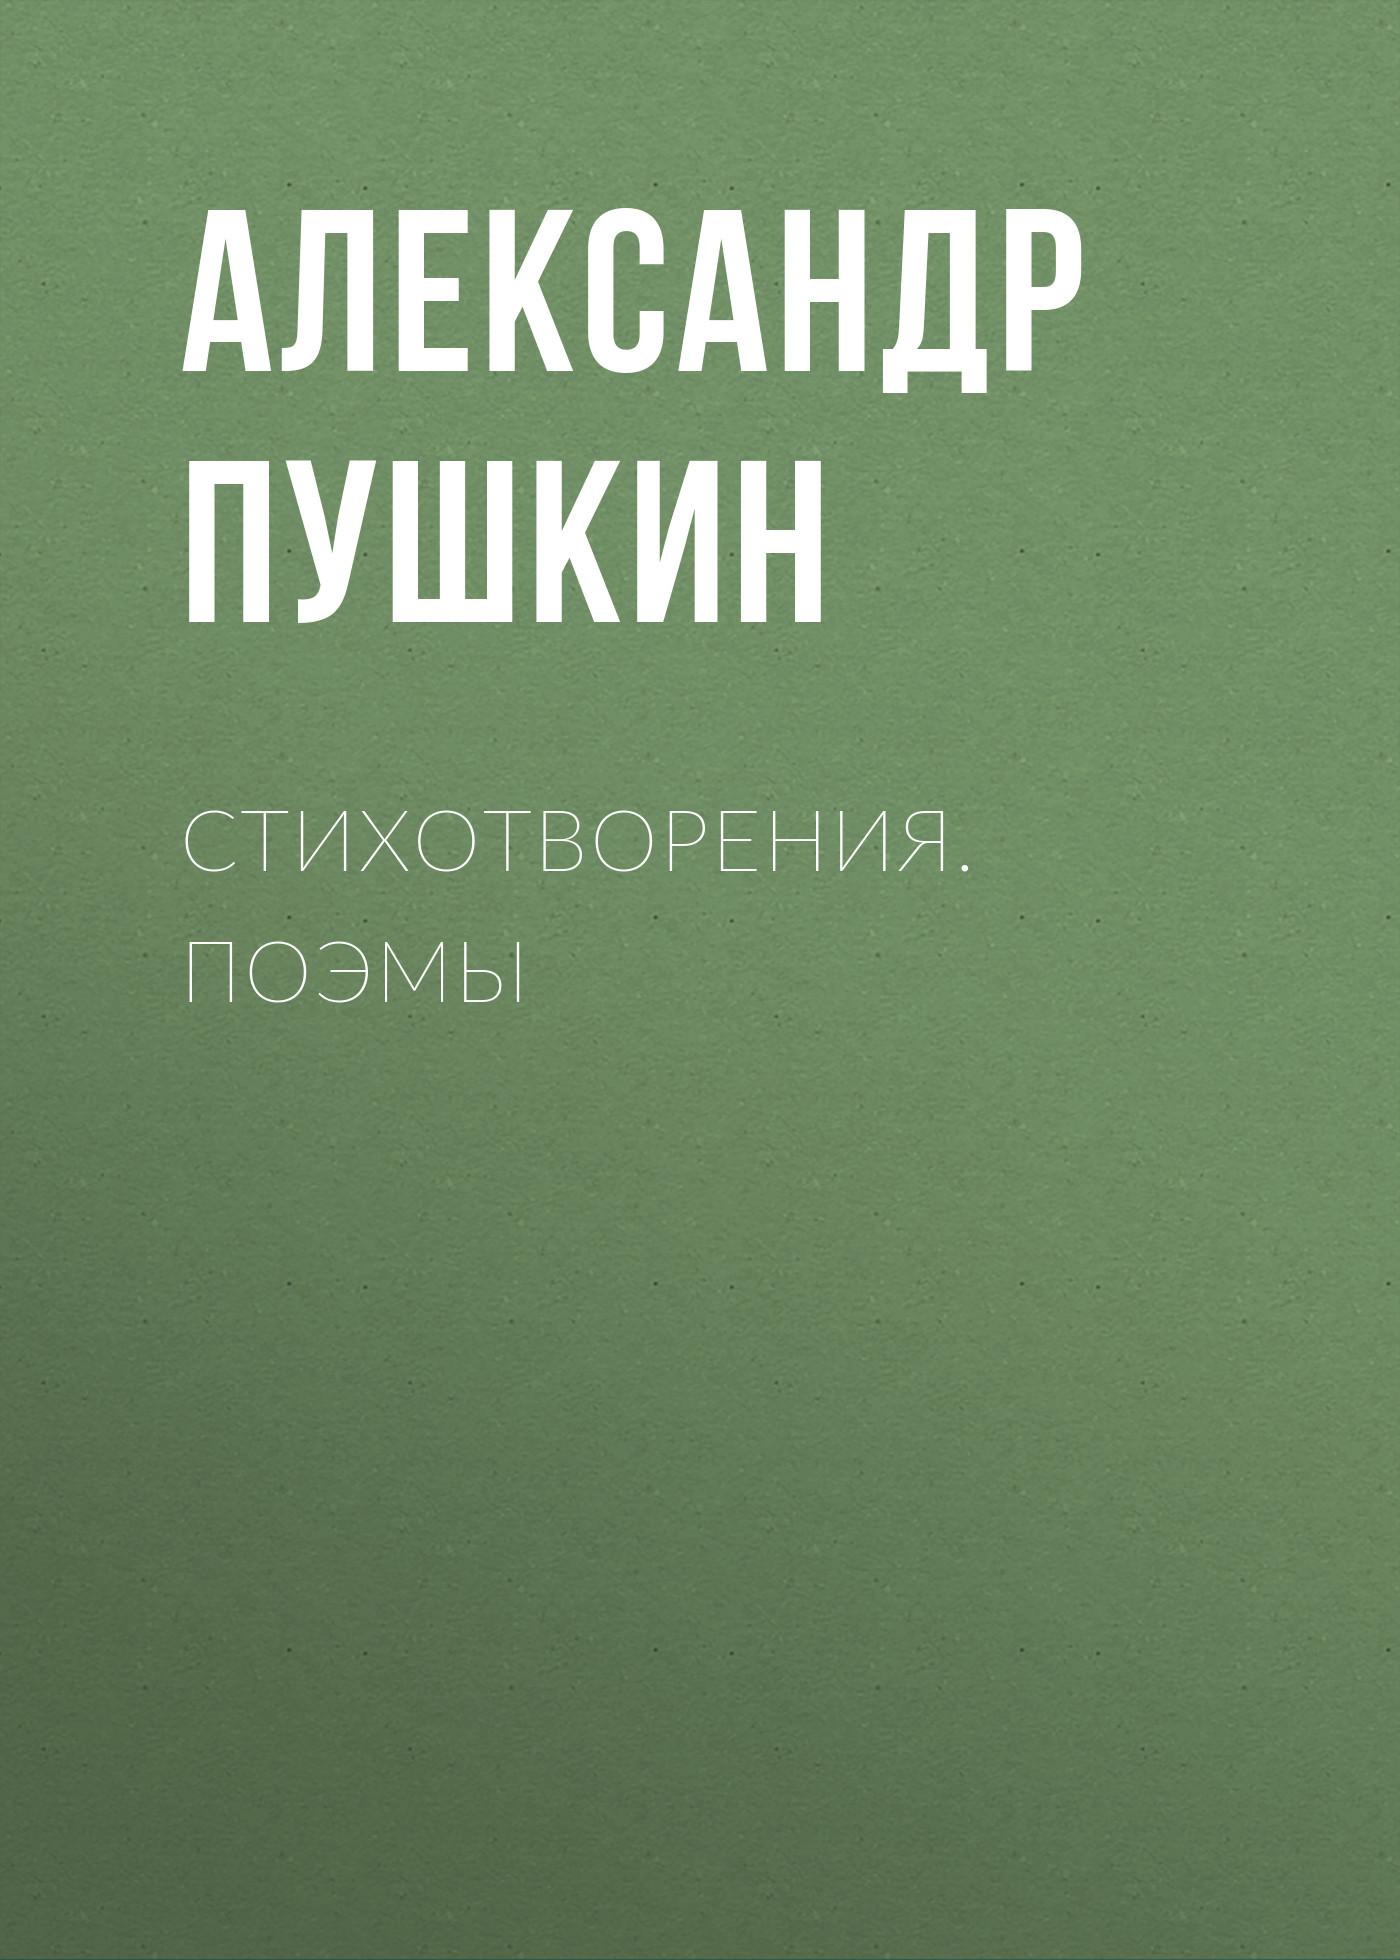 все цены на Александр Пушкин Стихотворения. Поэмы онлайн